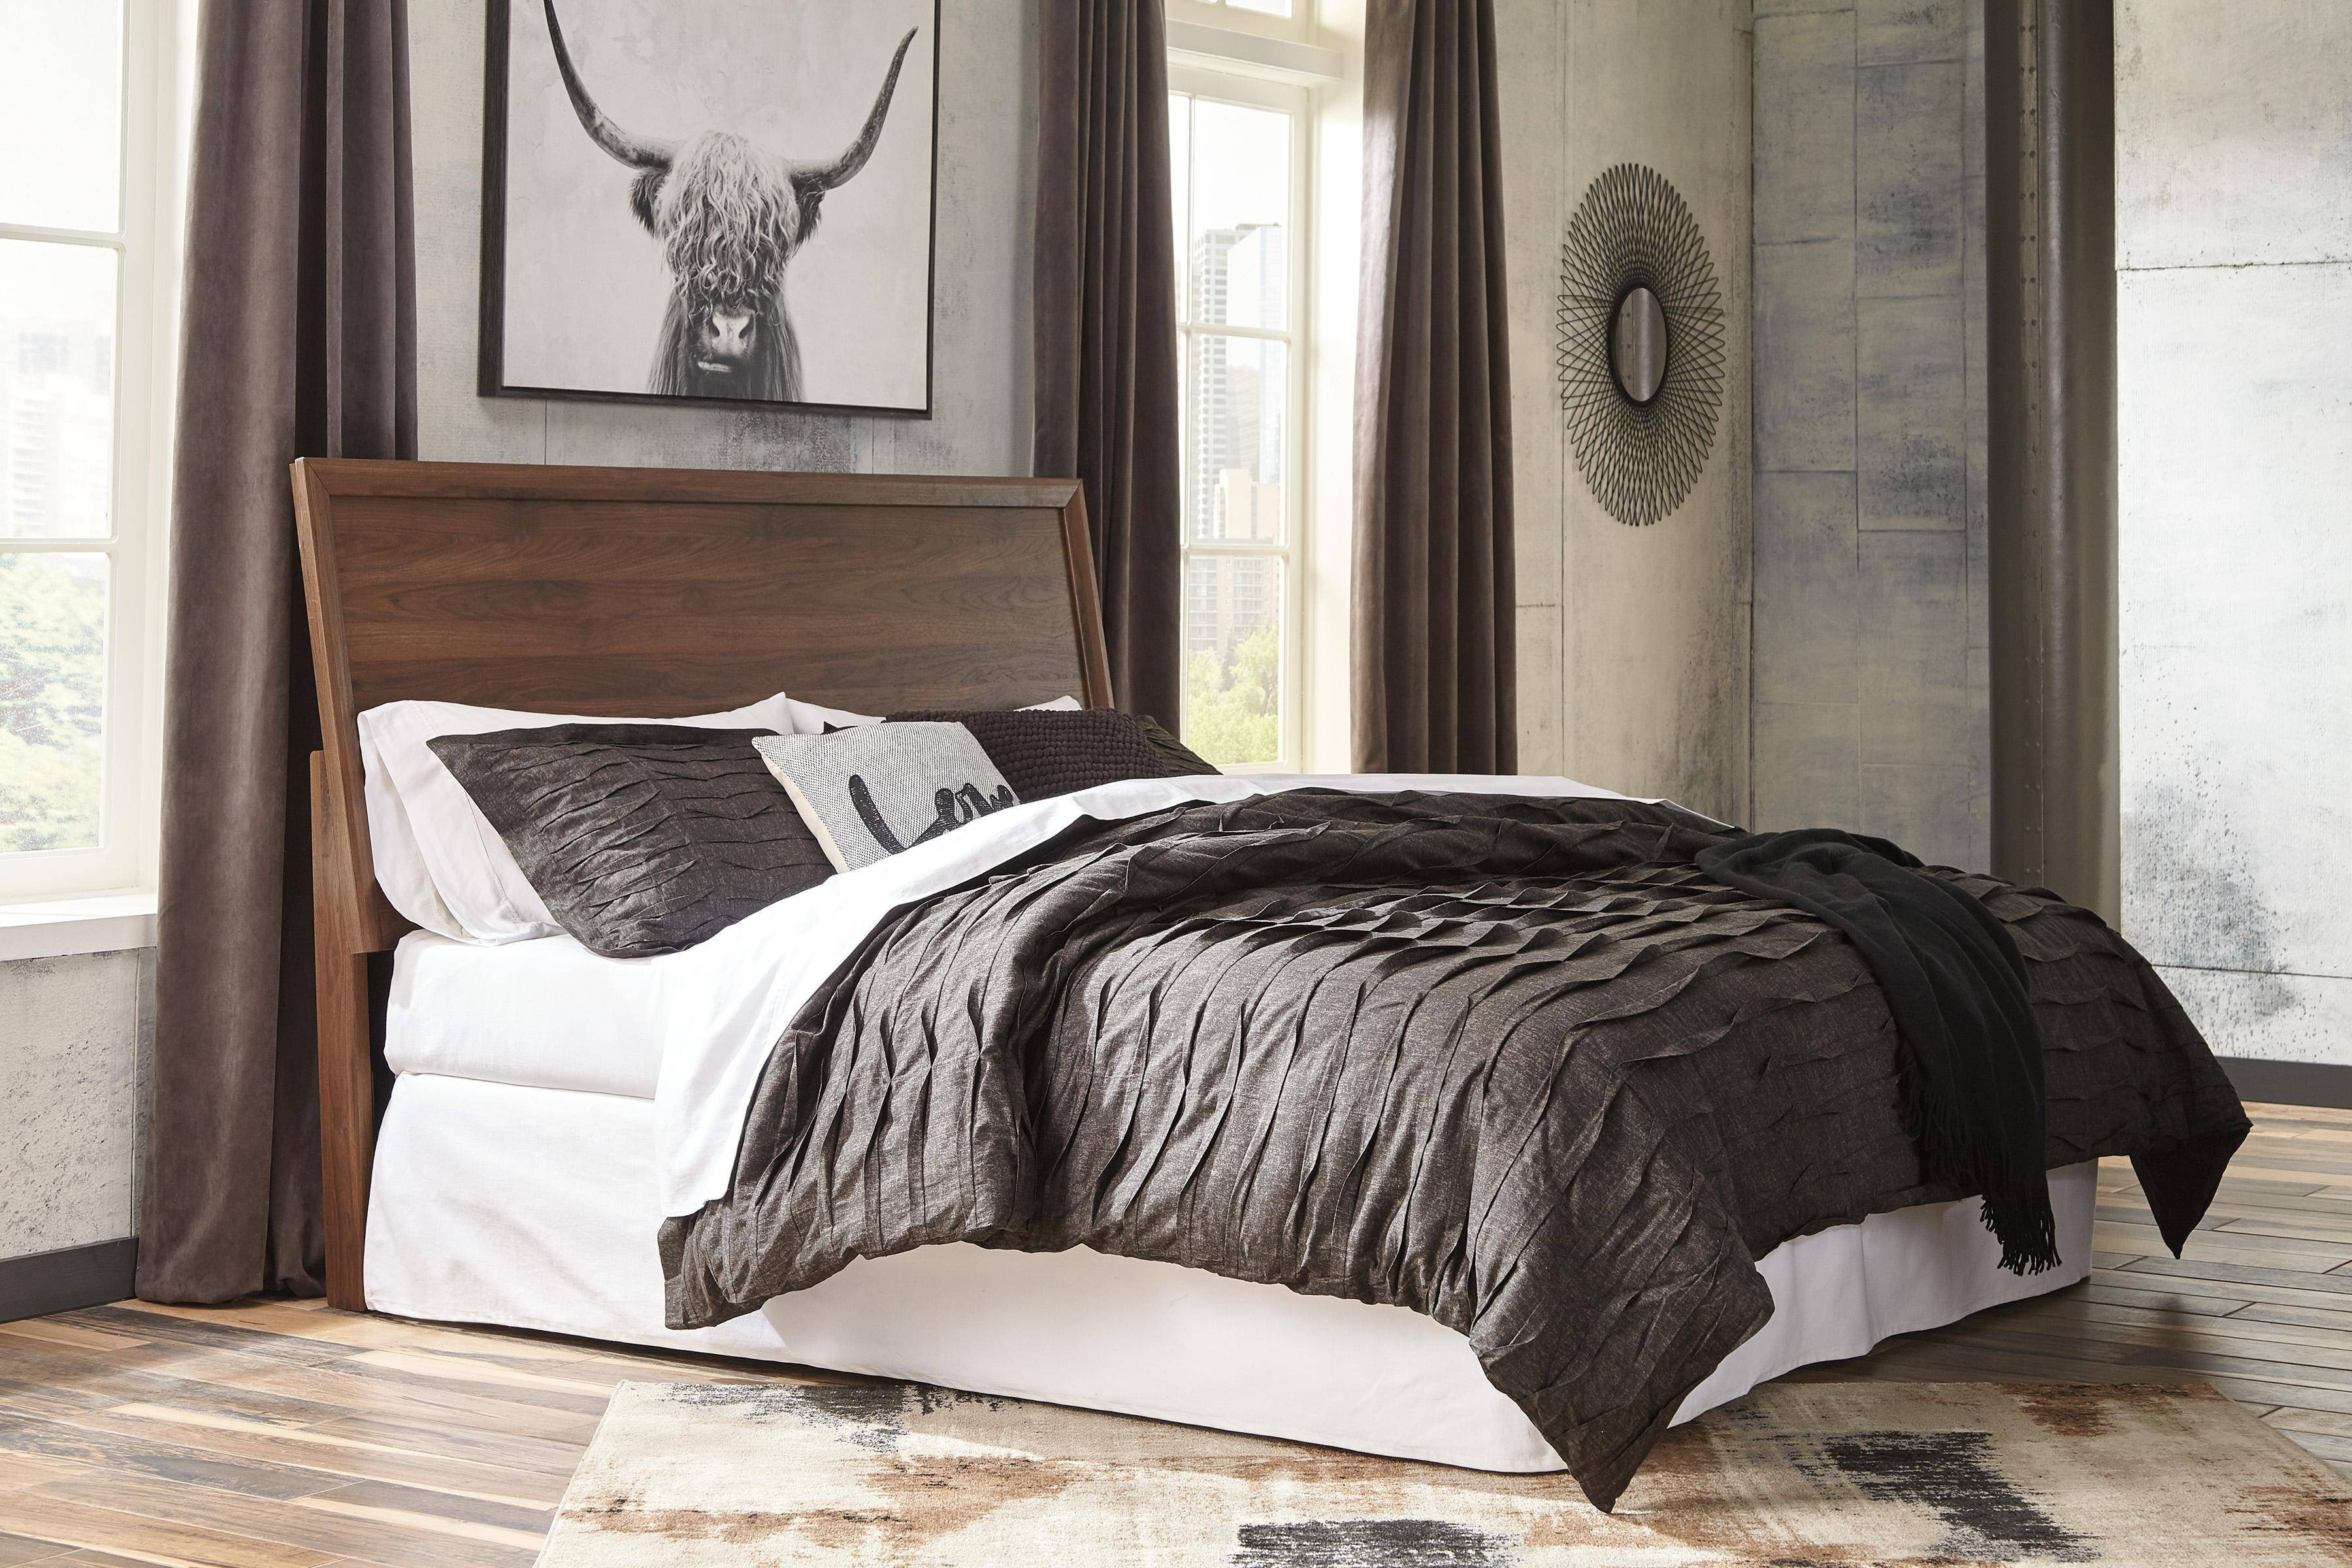 Bedroom Furniture Set Cheap Elegant ashley Daneston B292 King Size Panel Bedroom Set 6pcs In